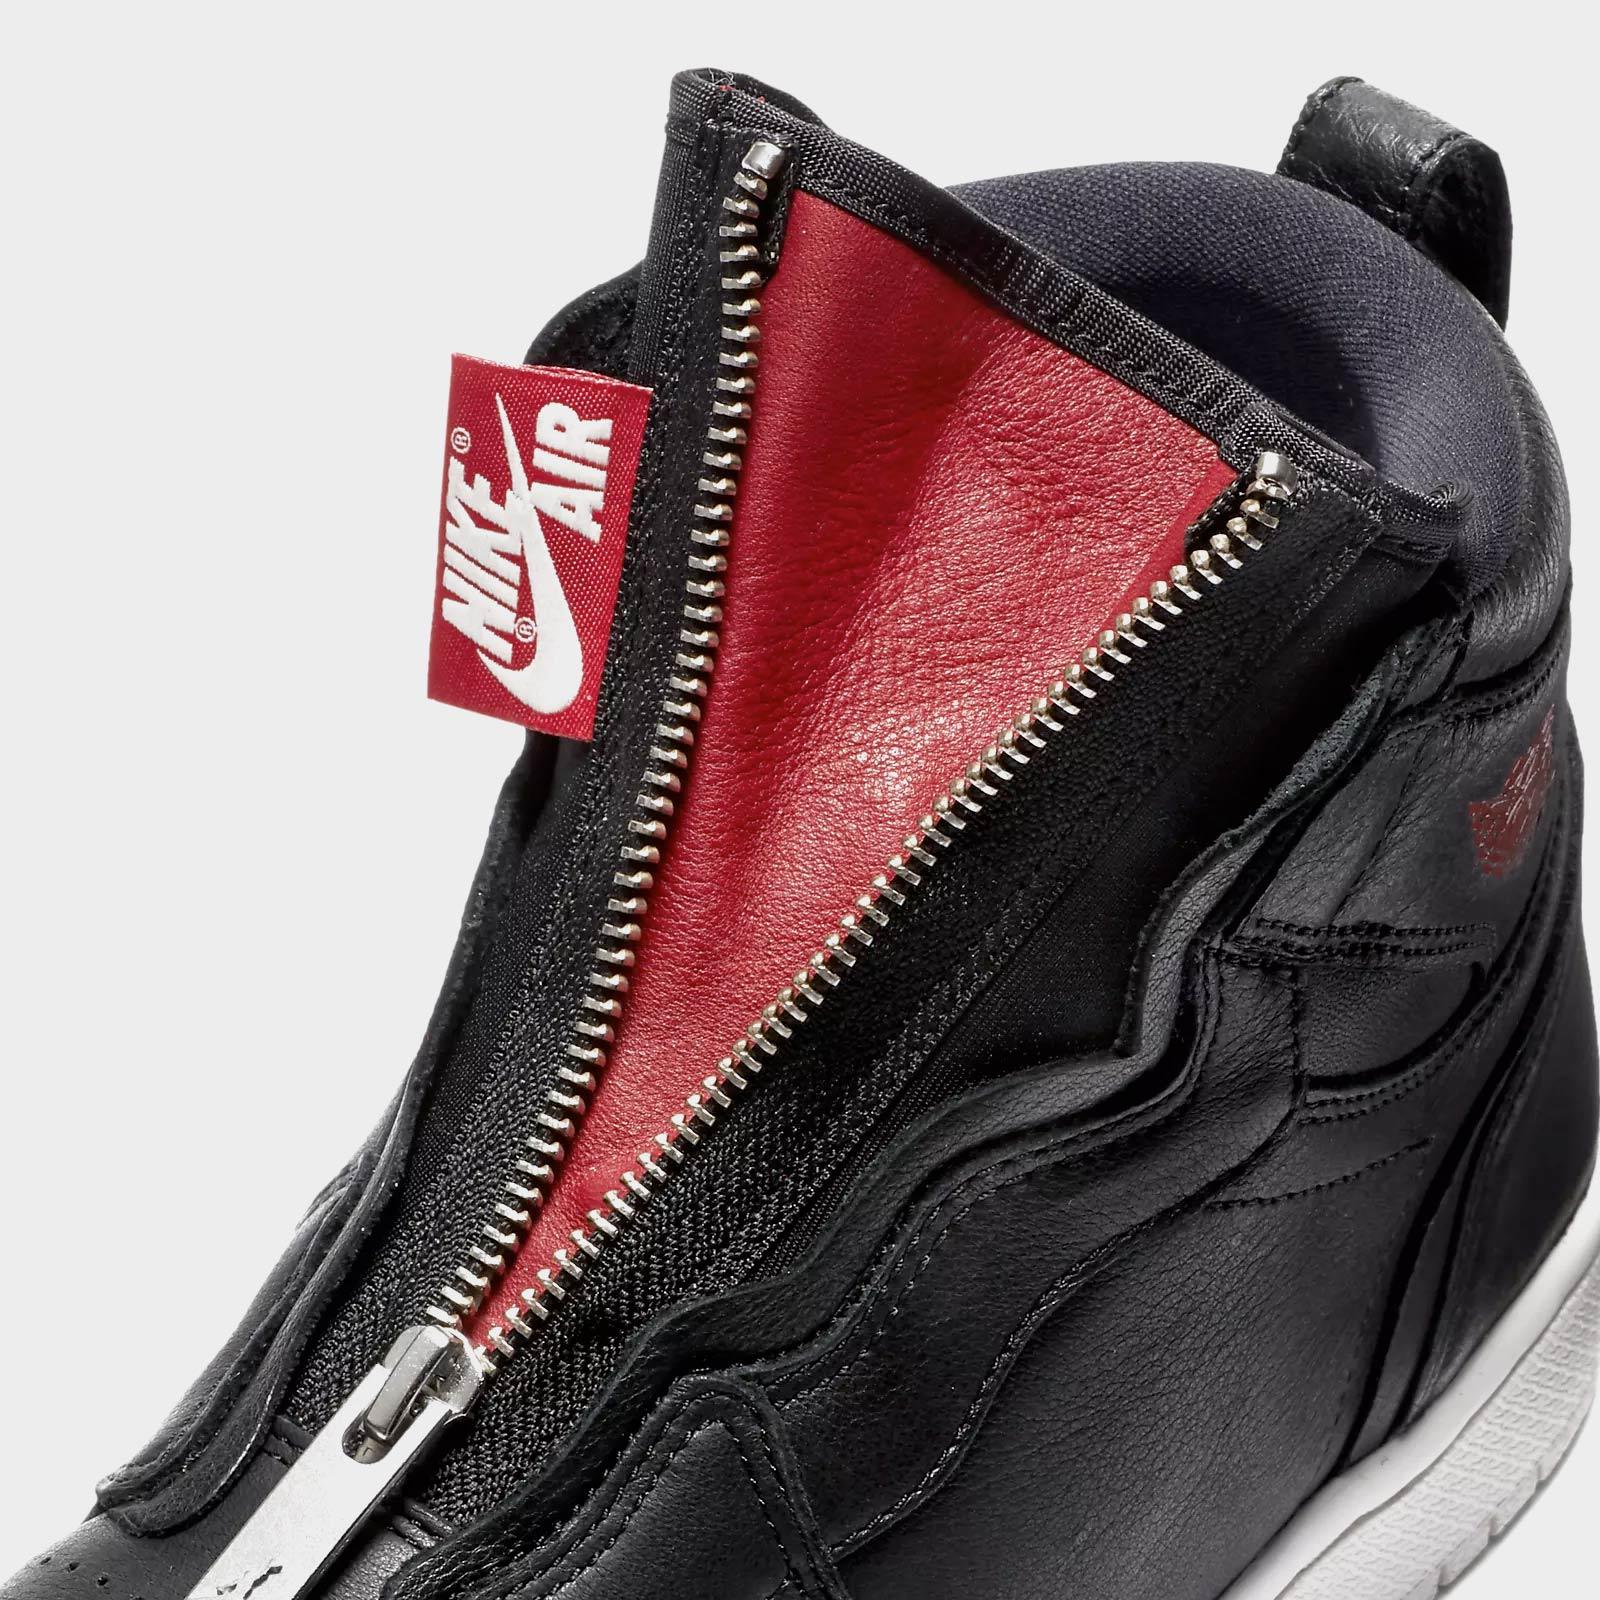 e07abf03469 Jordan Brand Air Jordan 1 High Zip - At0575-006 - Sneakersnstuff ...